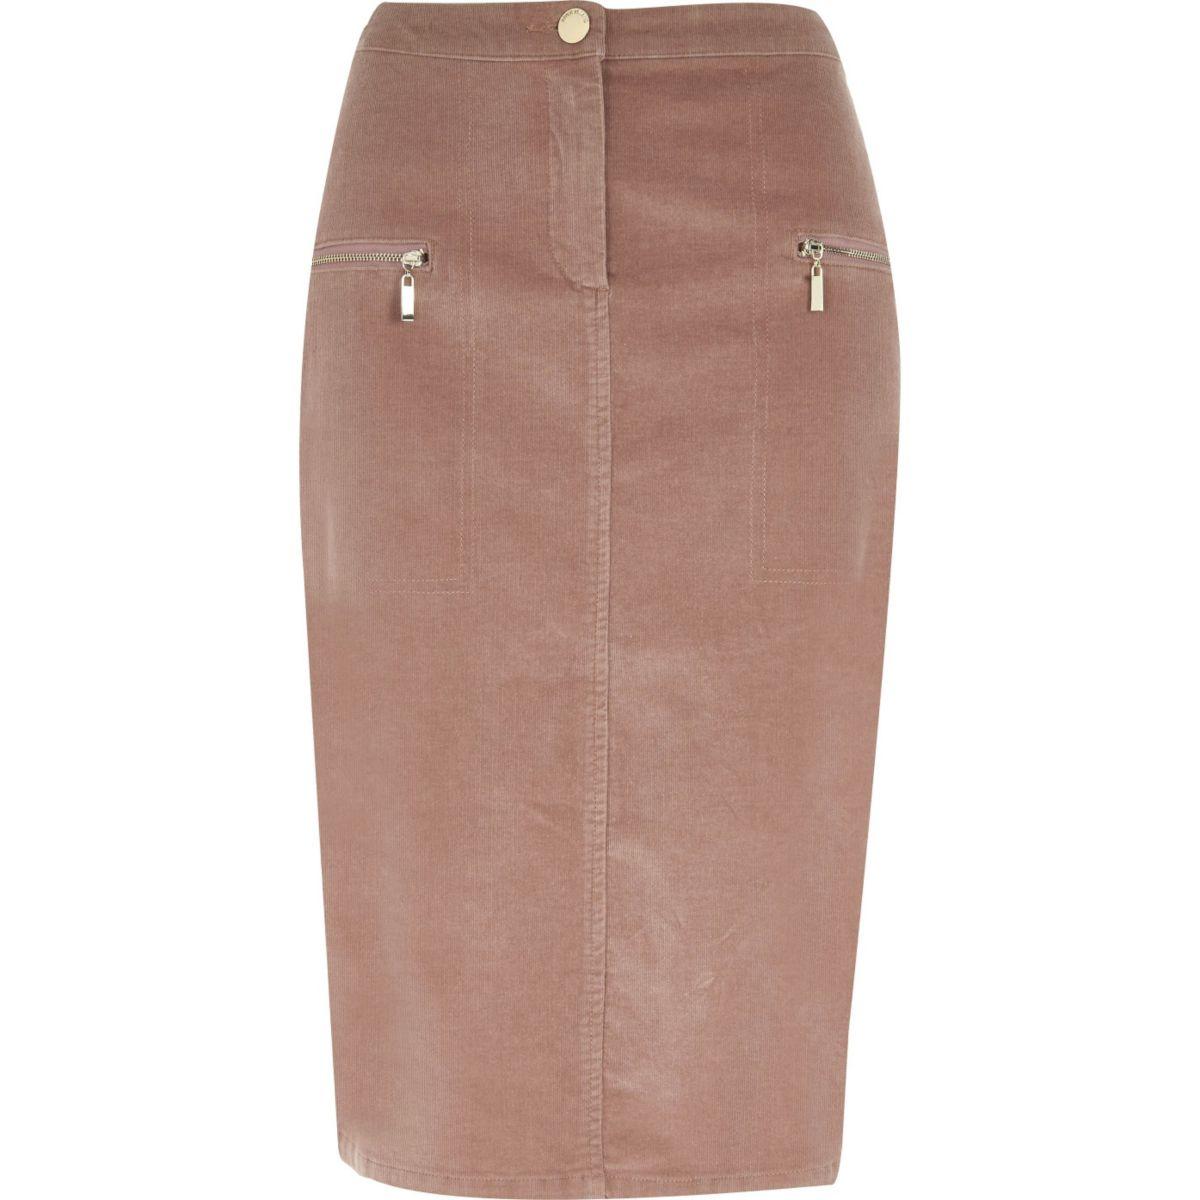 Dusty pink cord zip pocket midi pencil skirt